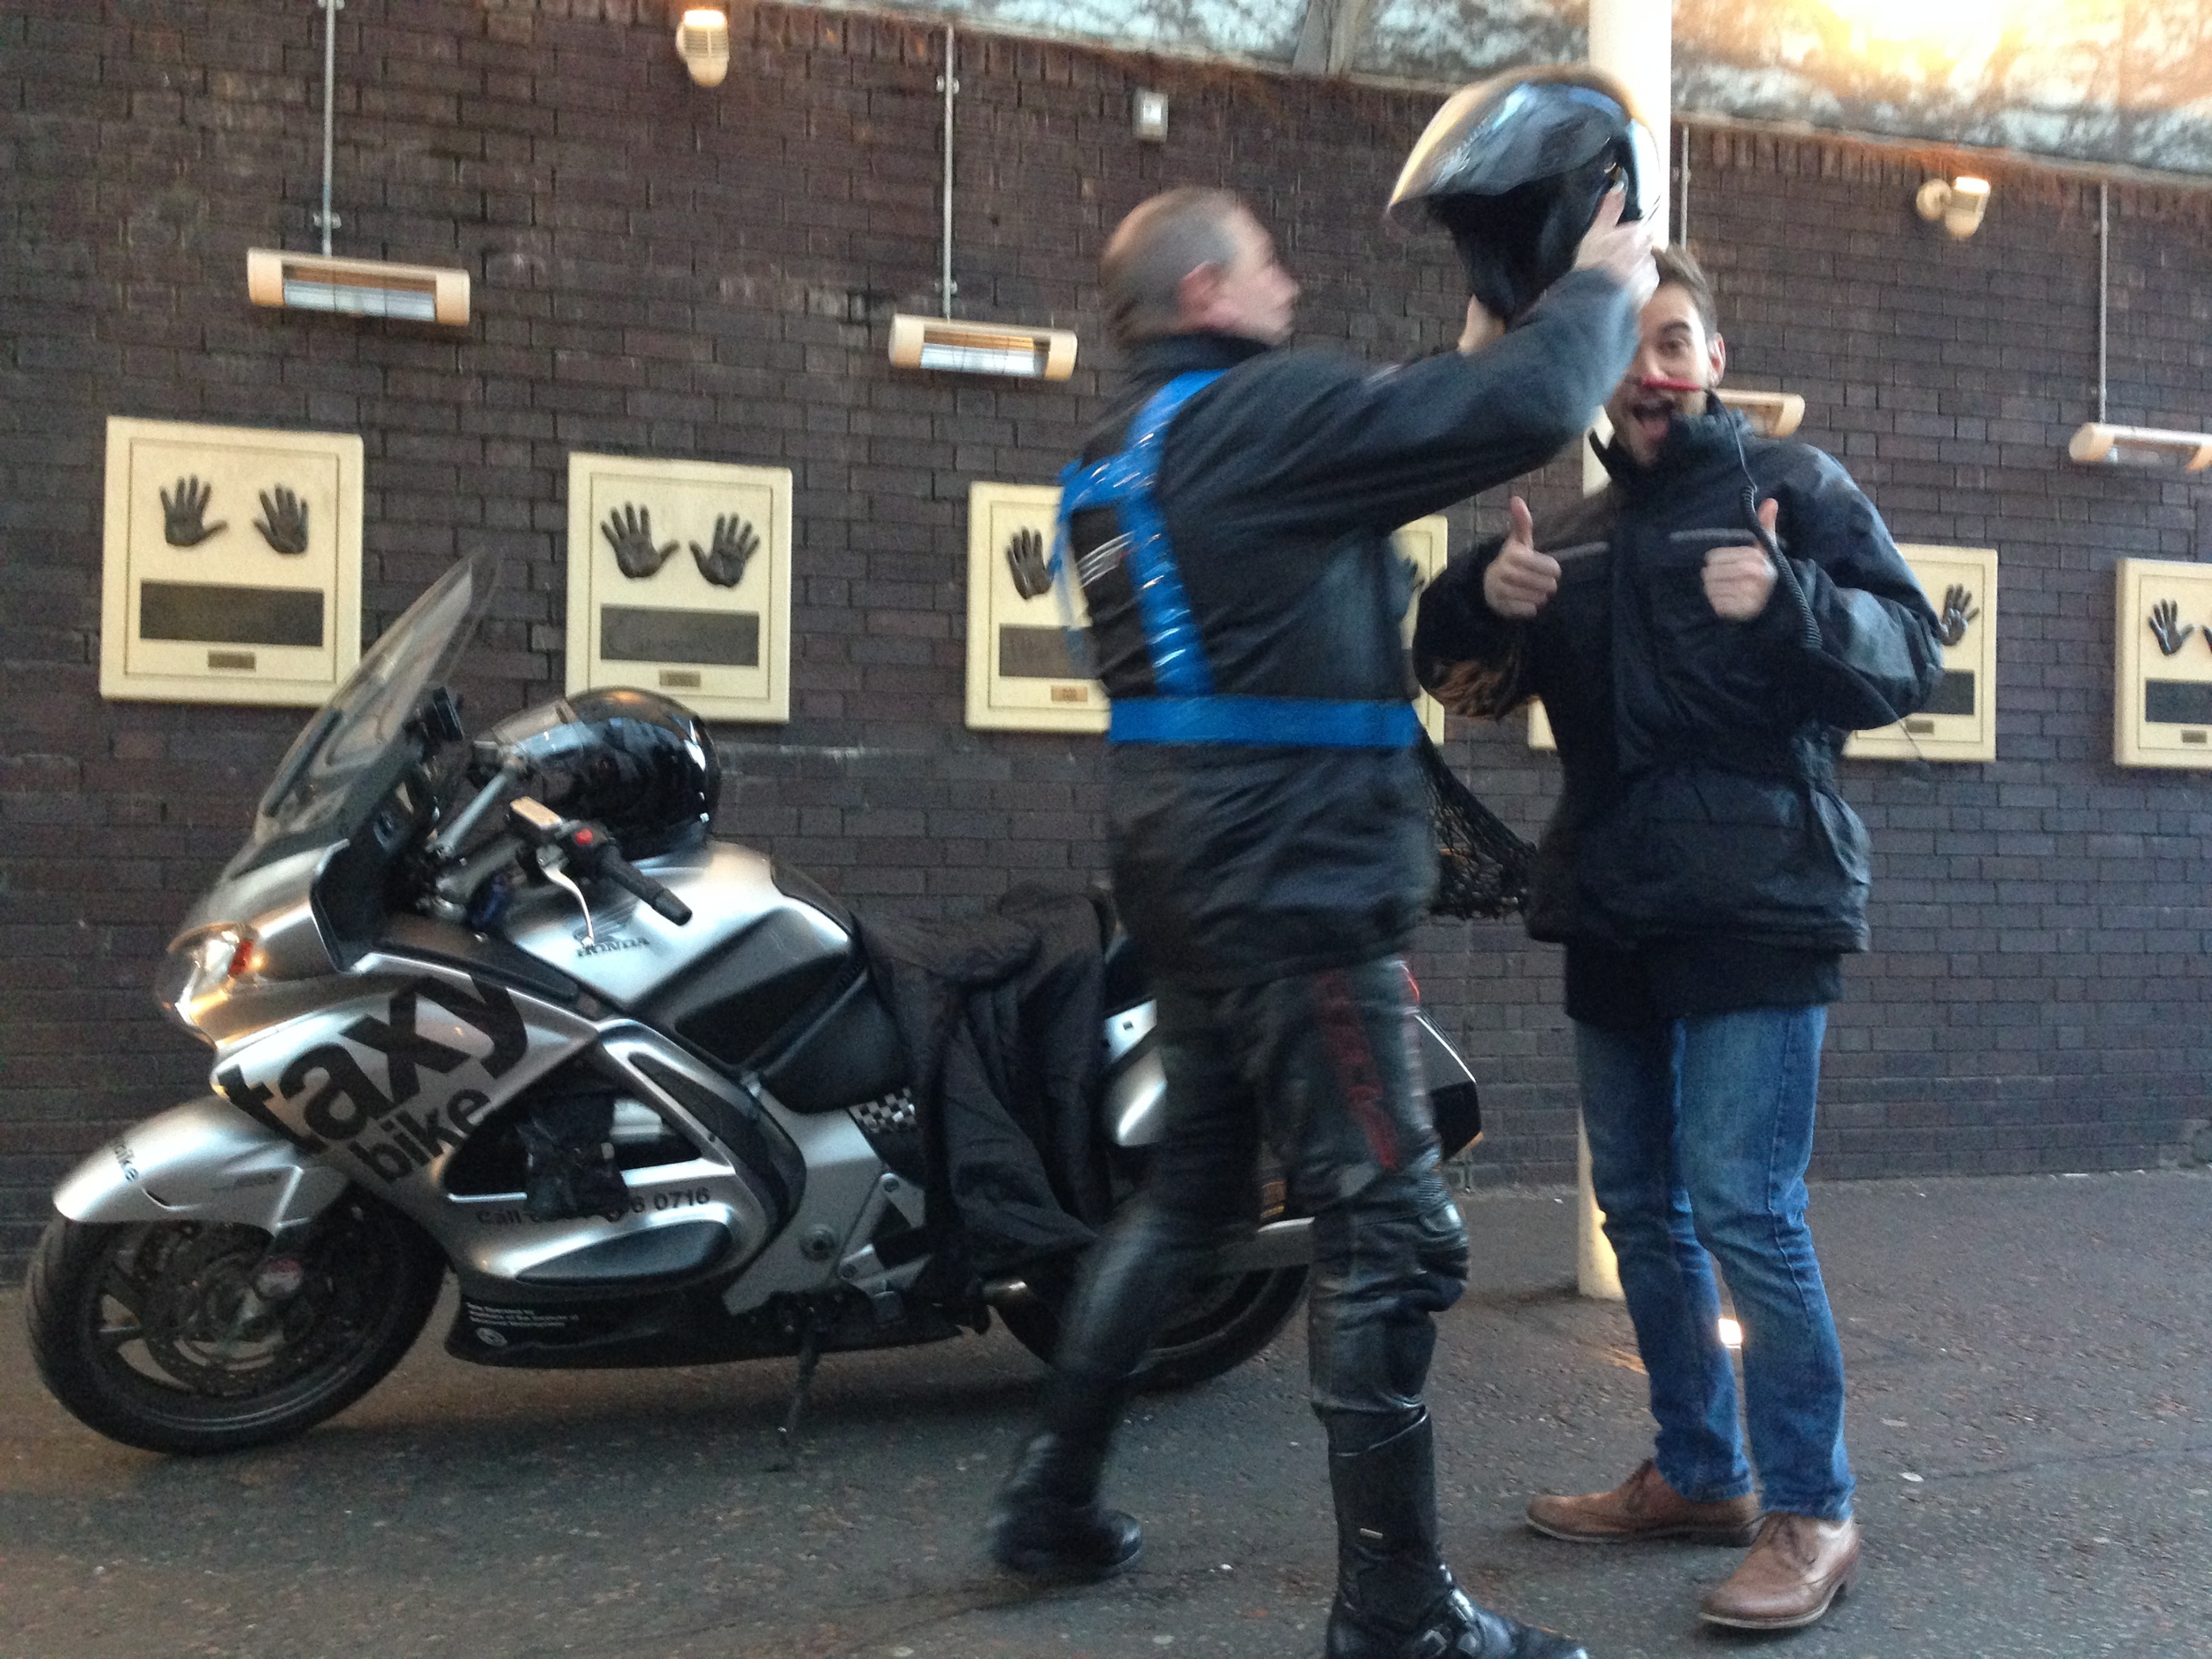 Jonny motorbike.JPG